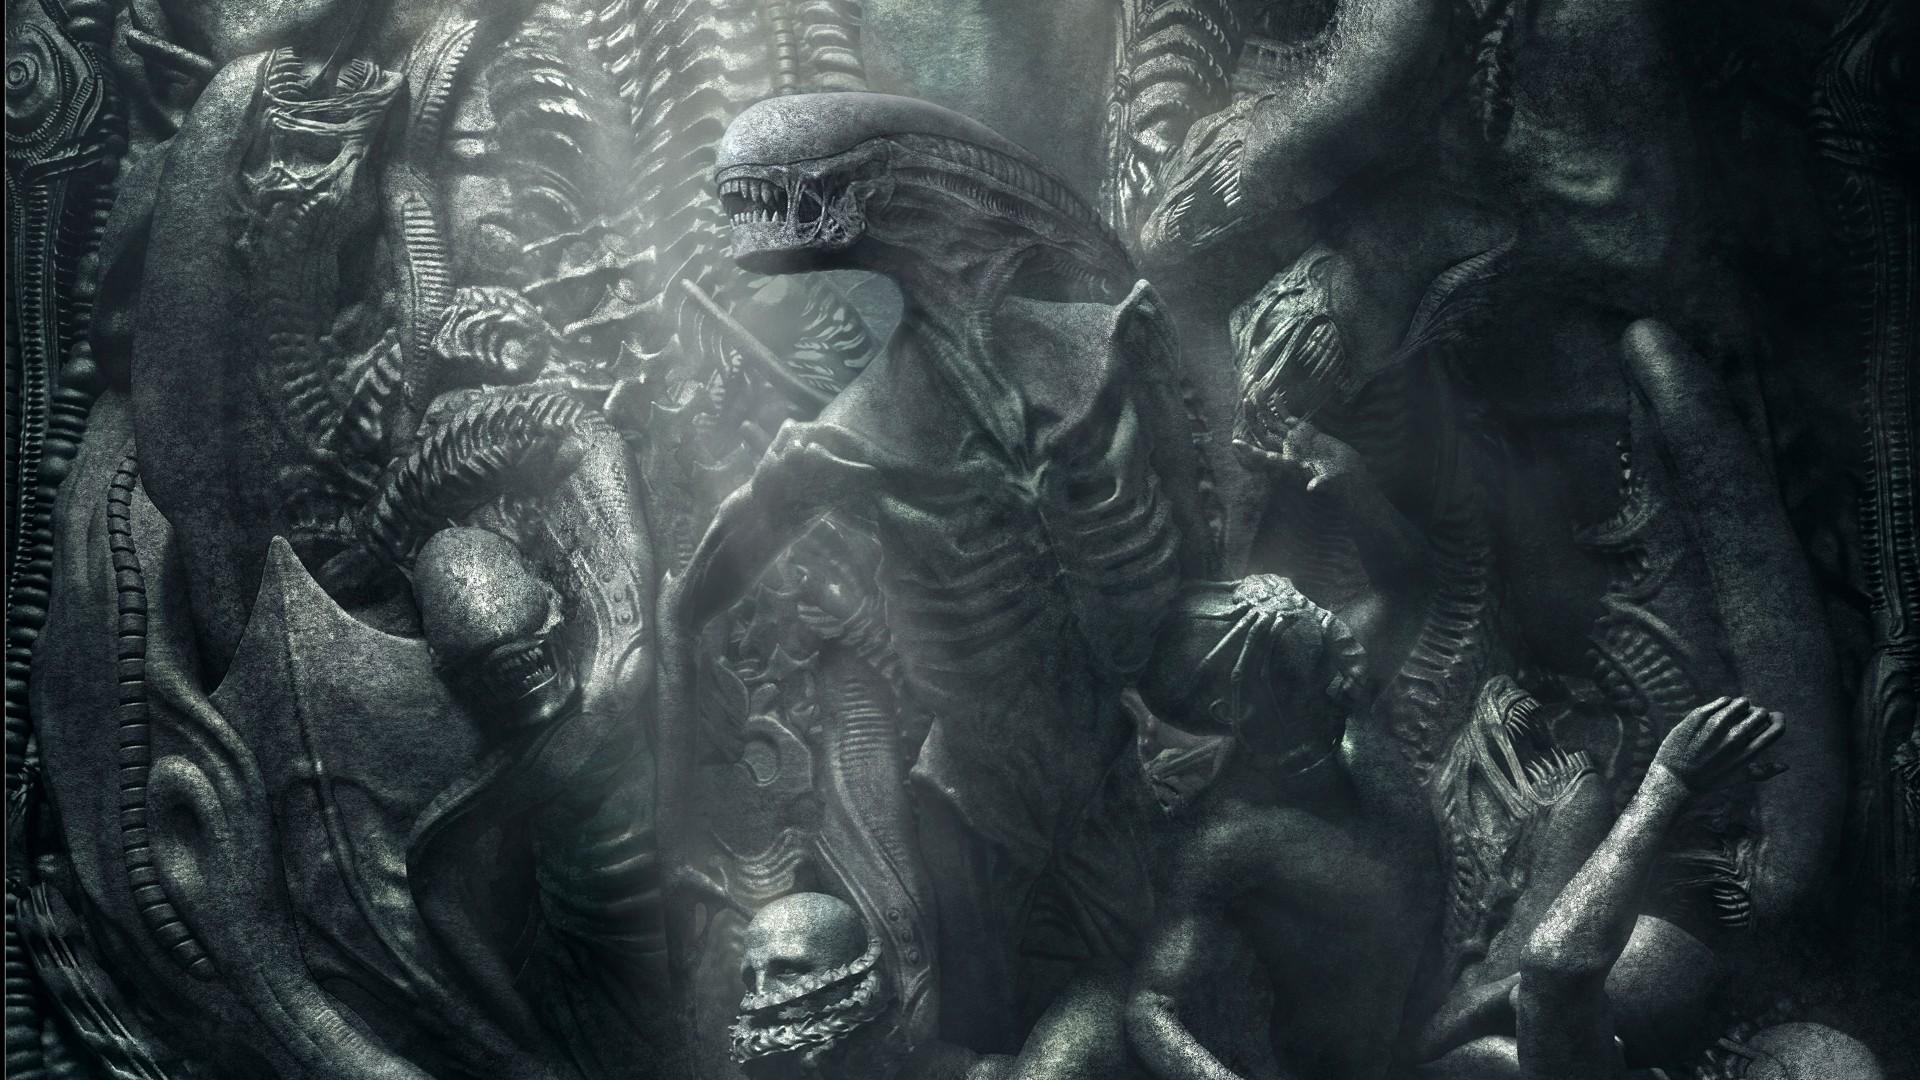 Joseph Gordon Levitt Iphone Wallpaper Alien Covenant 2017 Movie Wallpapers Hd Wallpapers Id